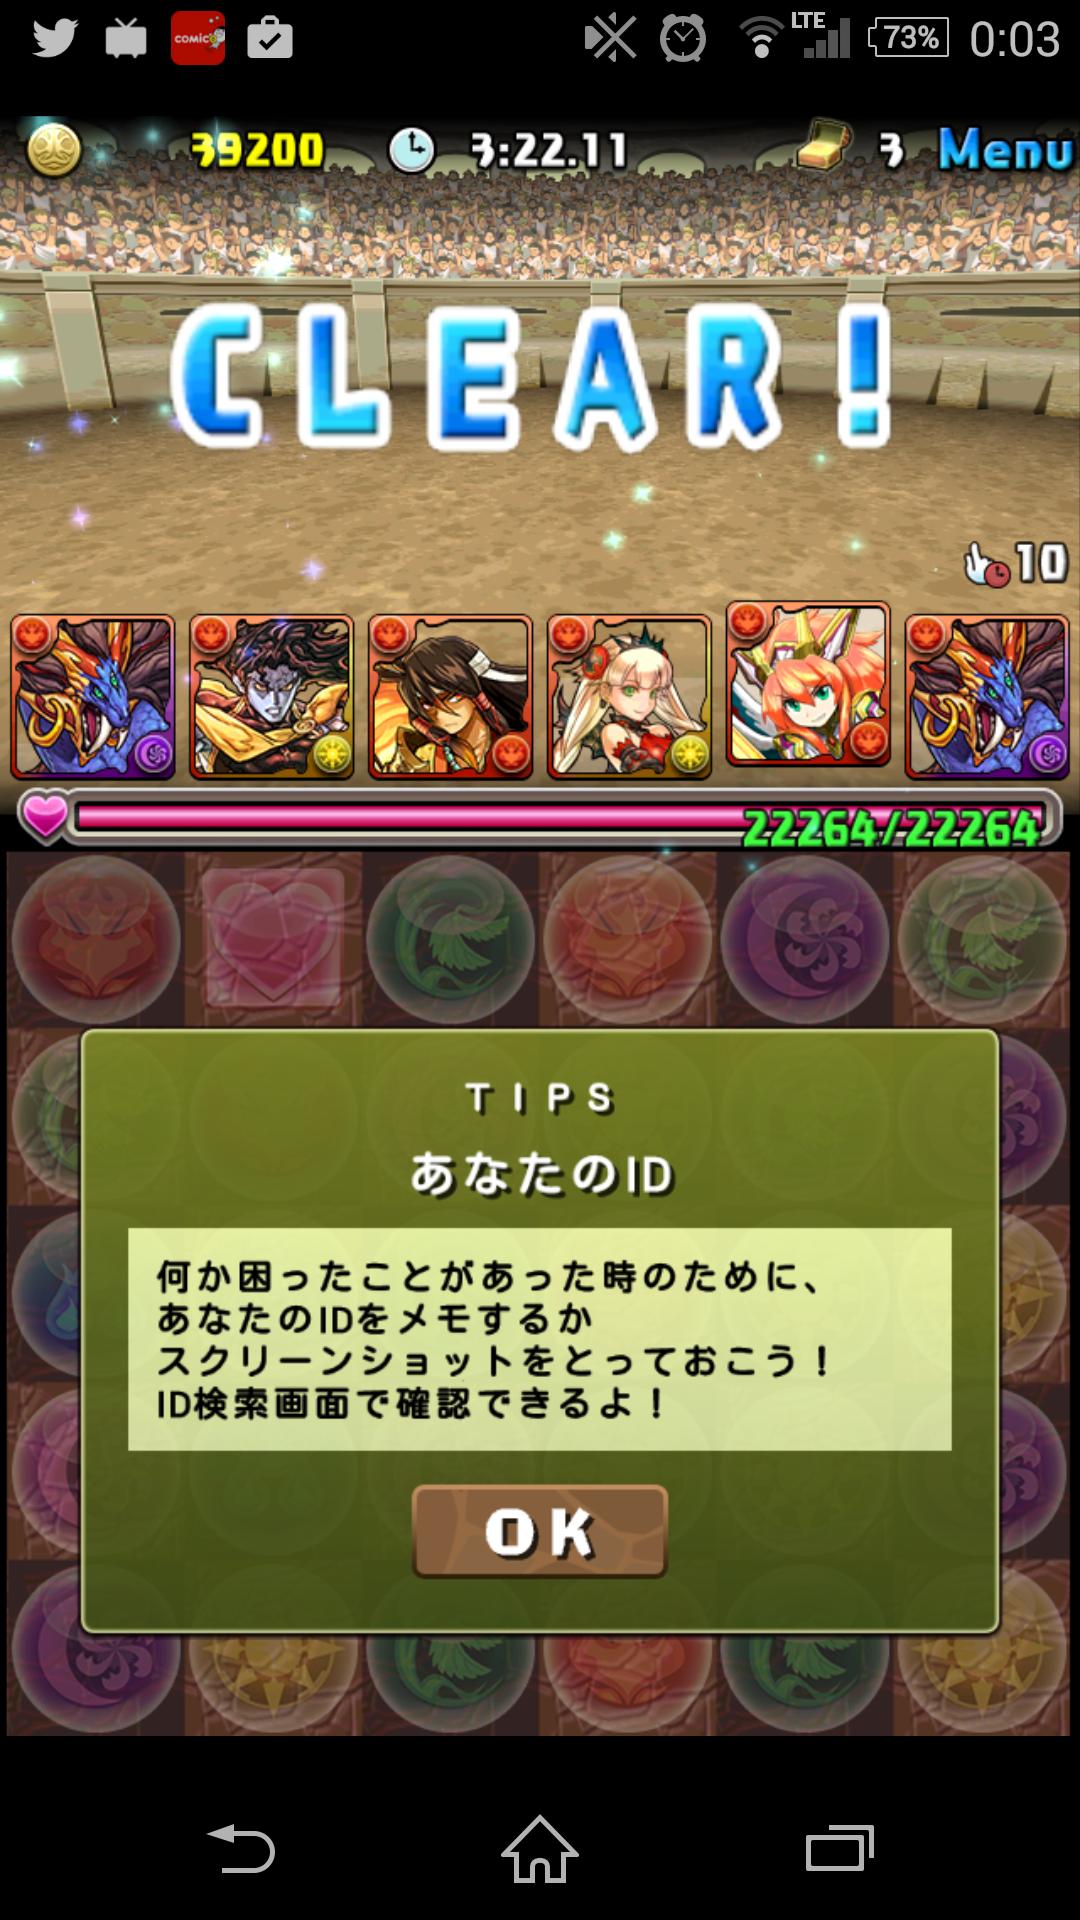 Screenshot_2015-09-11-00-03-43.png